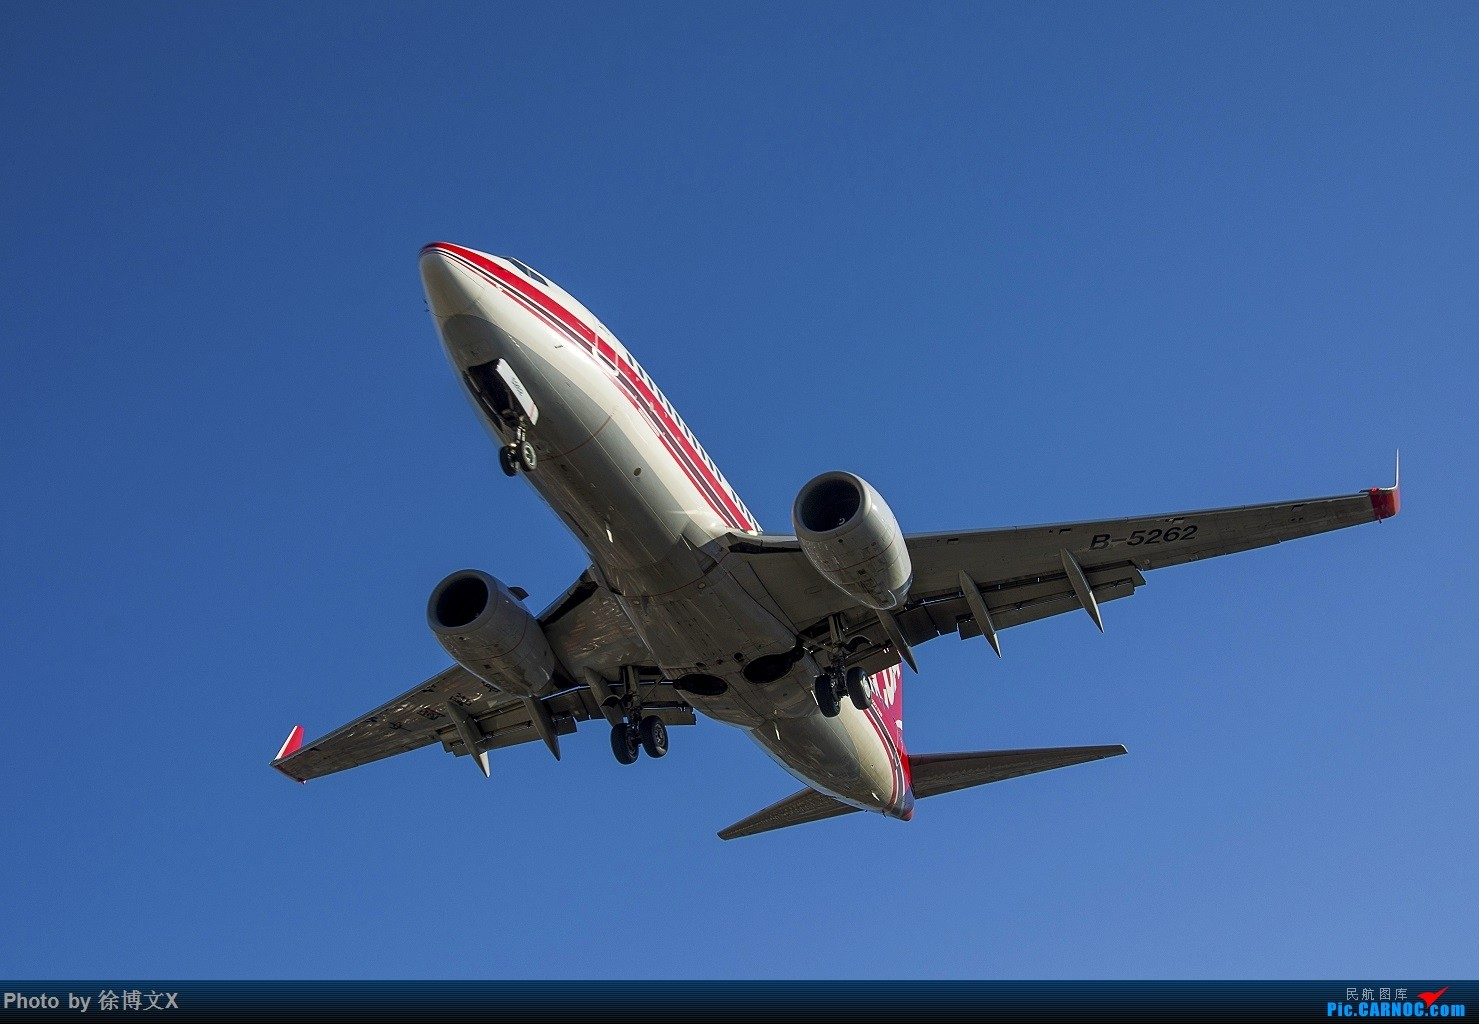 Re:[原创]南苑机场 中国联航 BOEING 737-700 B-5262 中国北京南苑机场